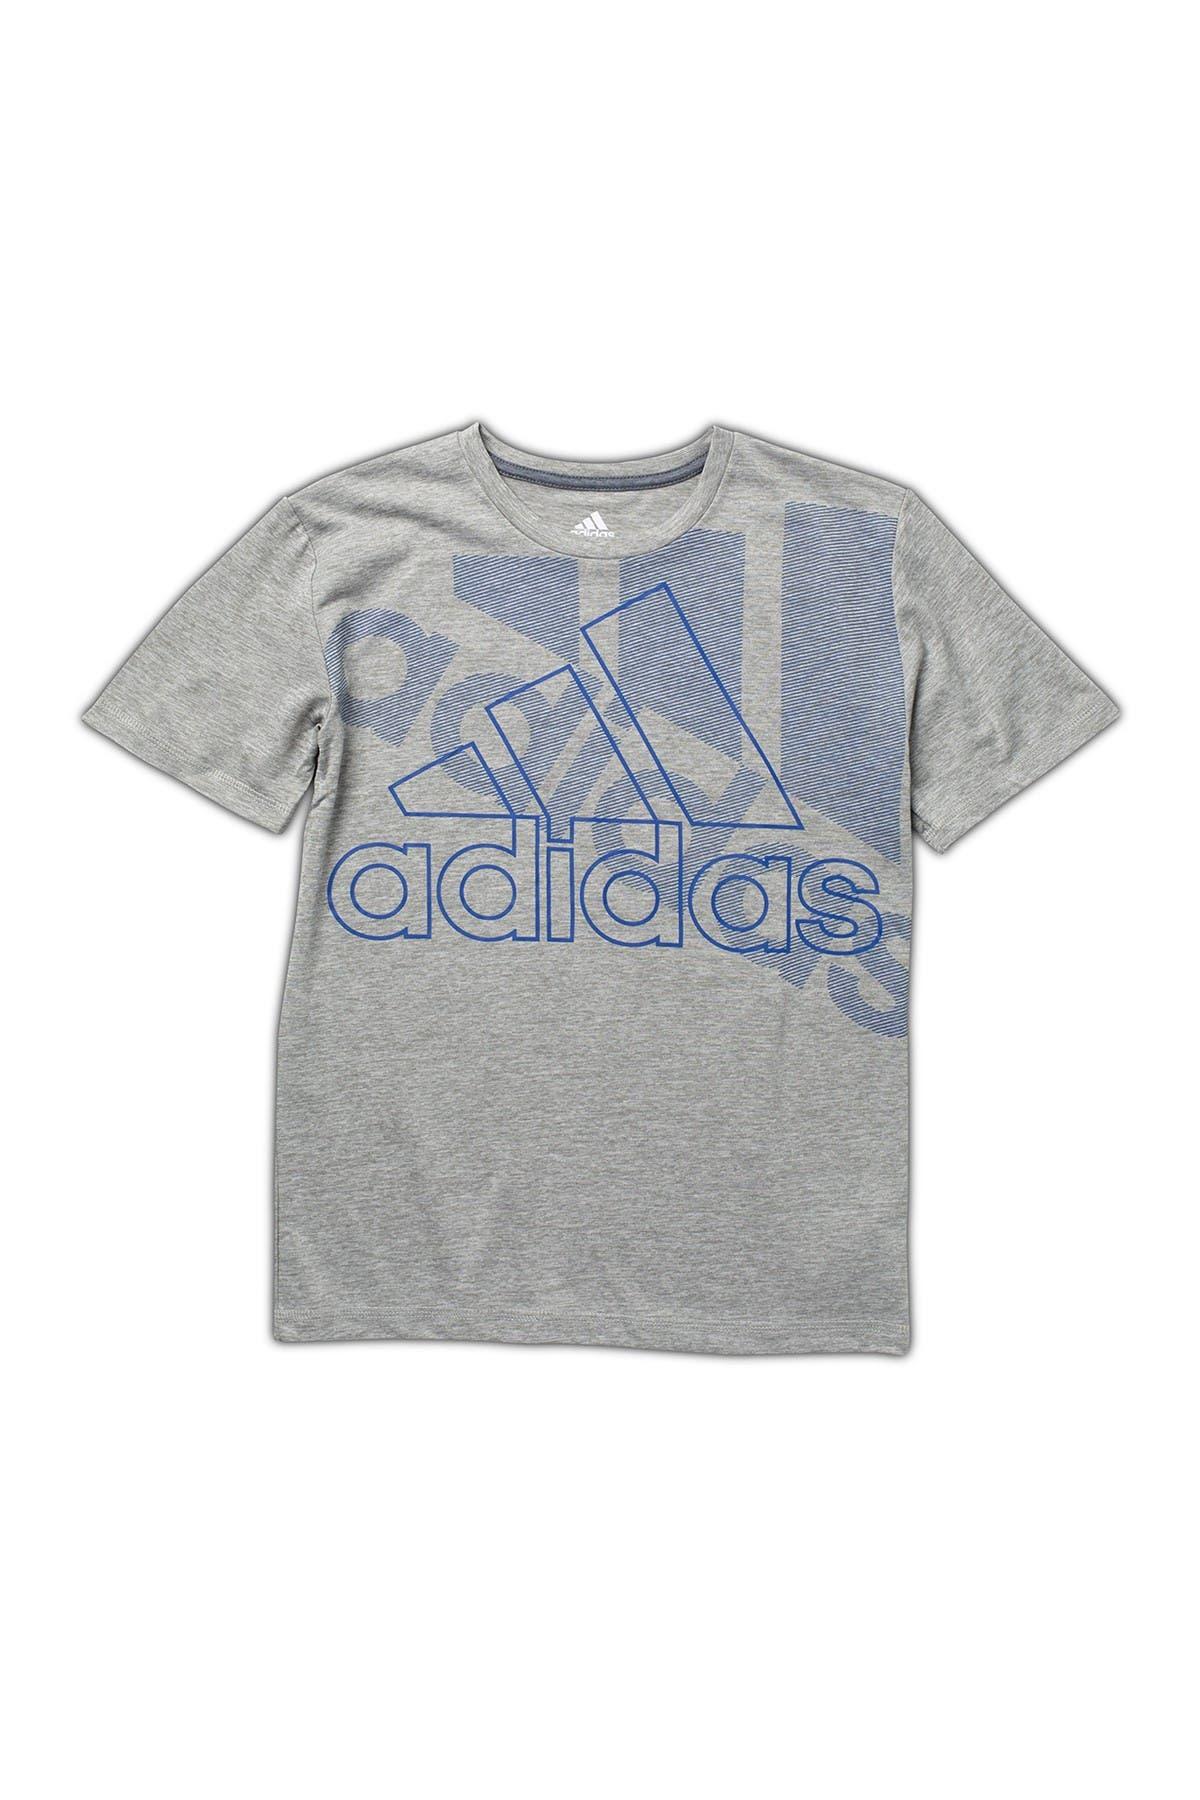 Image of adidas Short Sleeve Statement T-Shirt